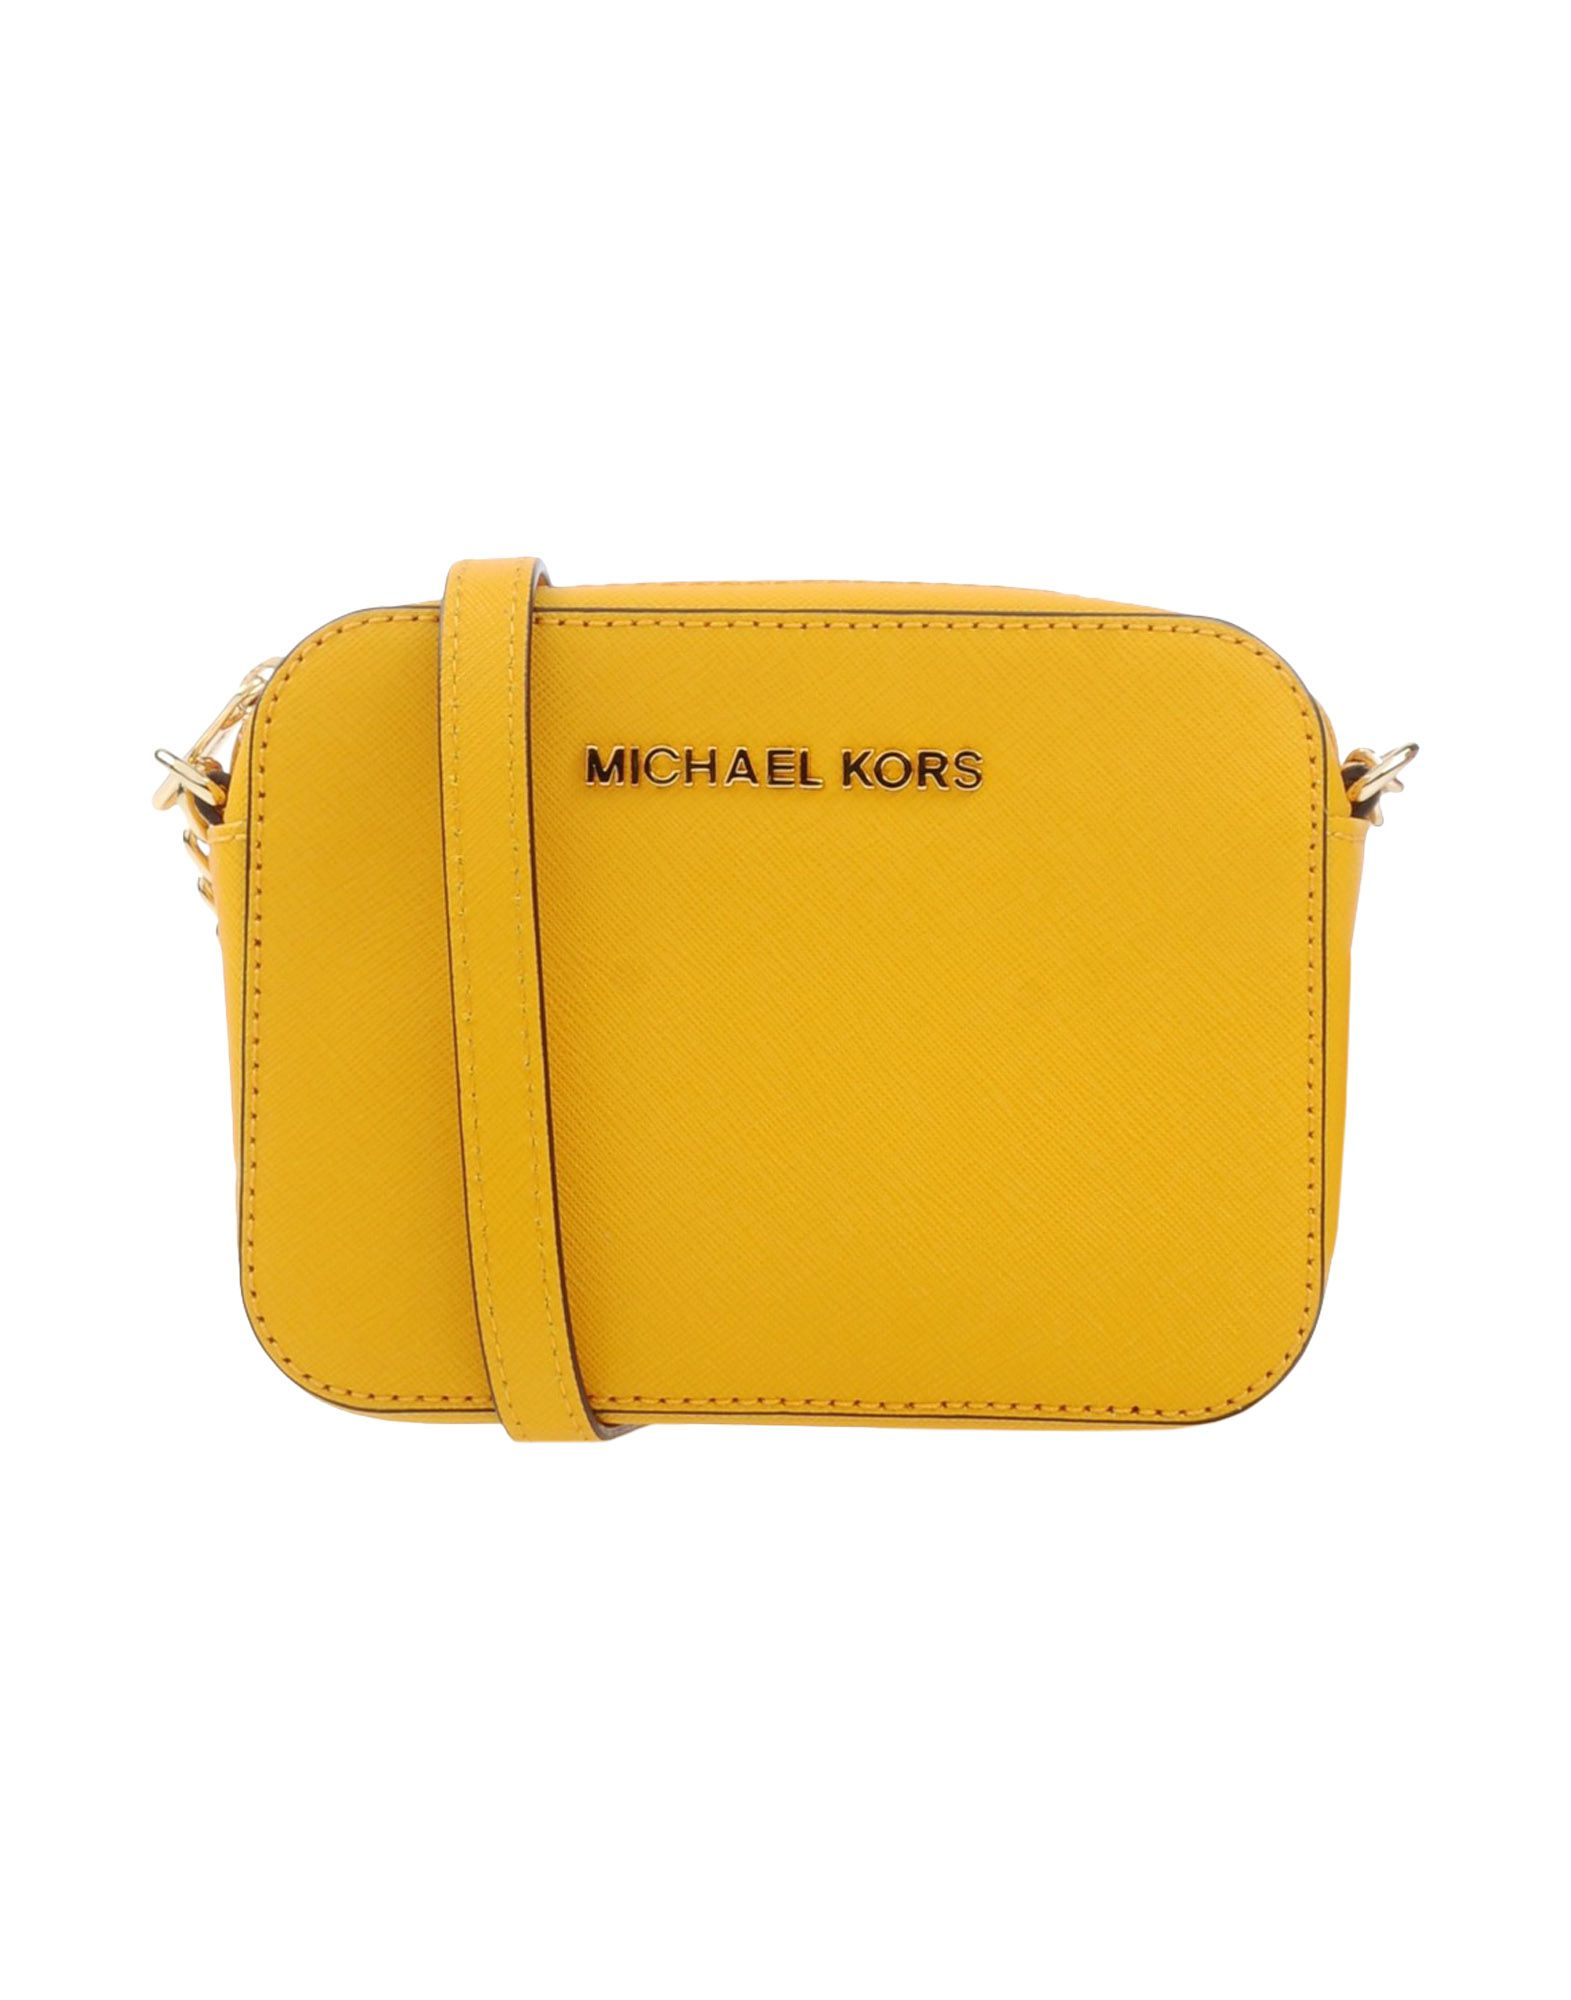 2e840a23398d6e ... where can i buy lyst michael michael kors cross body bag in yellow  e912c a466d